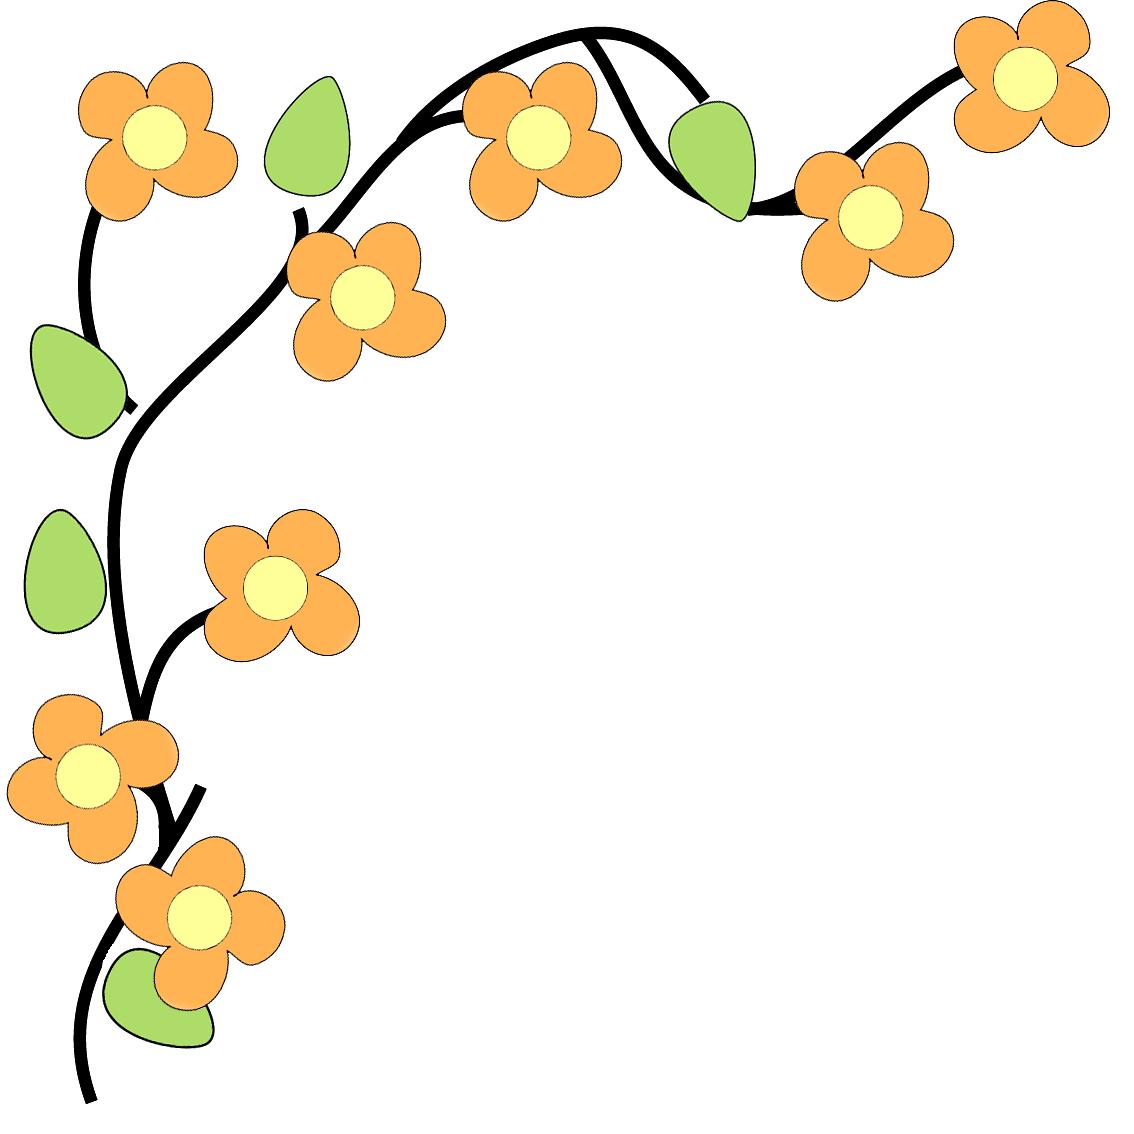 svg black and white stock Free flower clipart borders. Border panda images flowerborderclipart